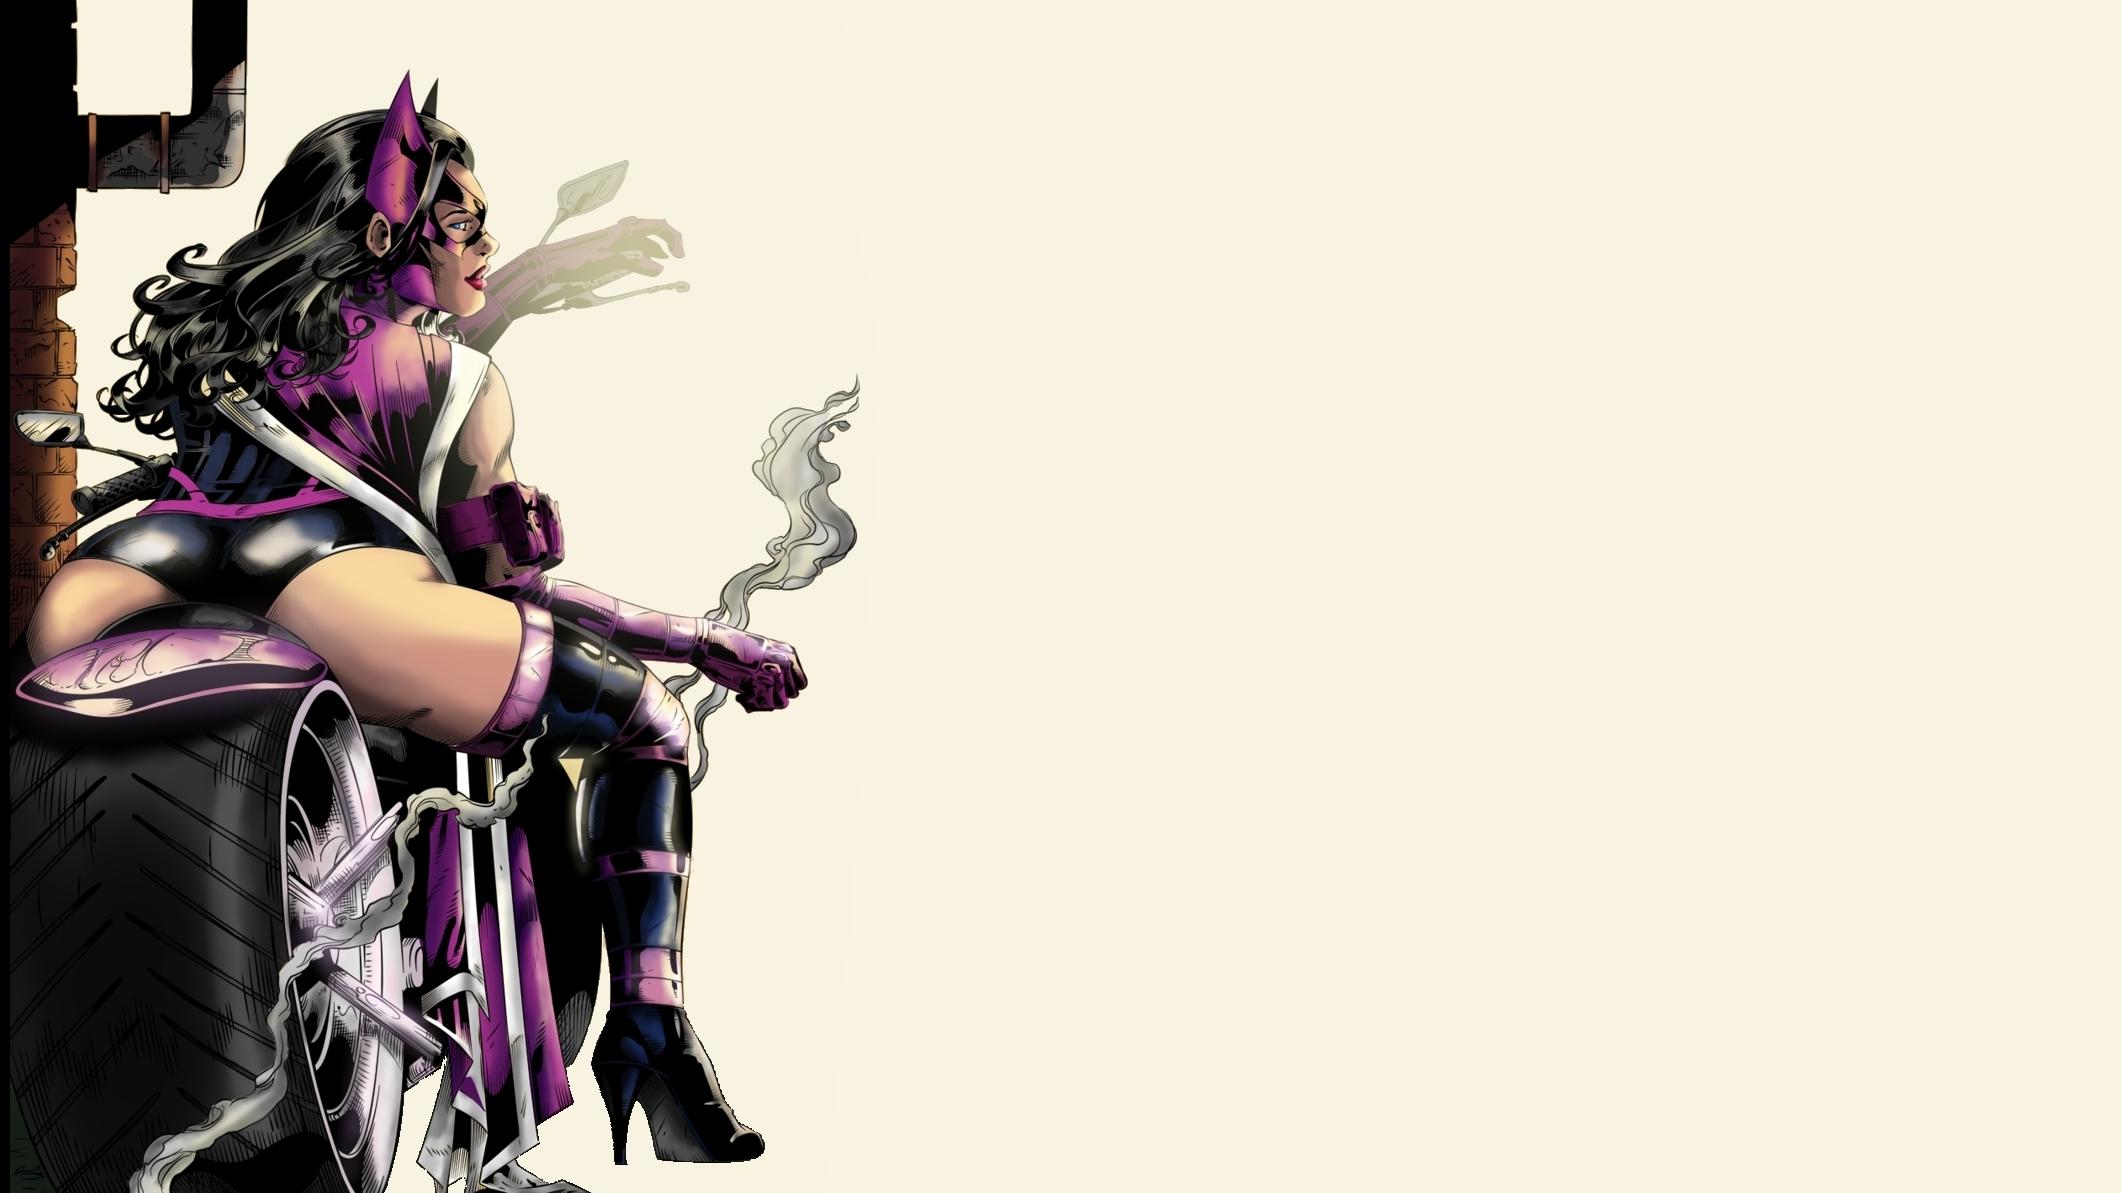 Huntress HD Wallpaper Background Image 2121x1193 ID593565 2121x1193